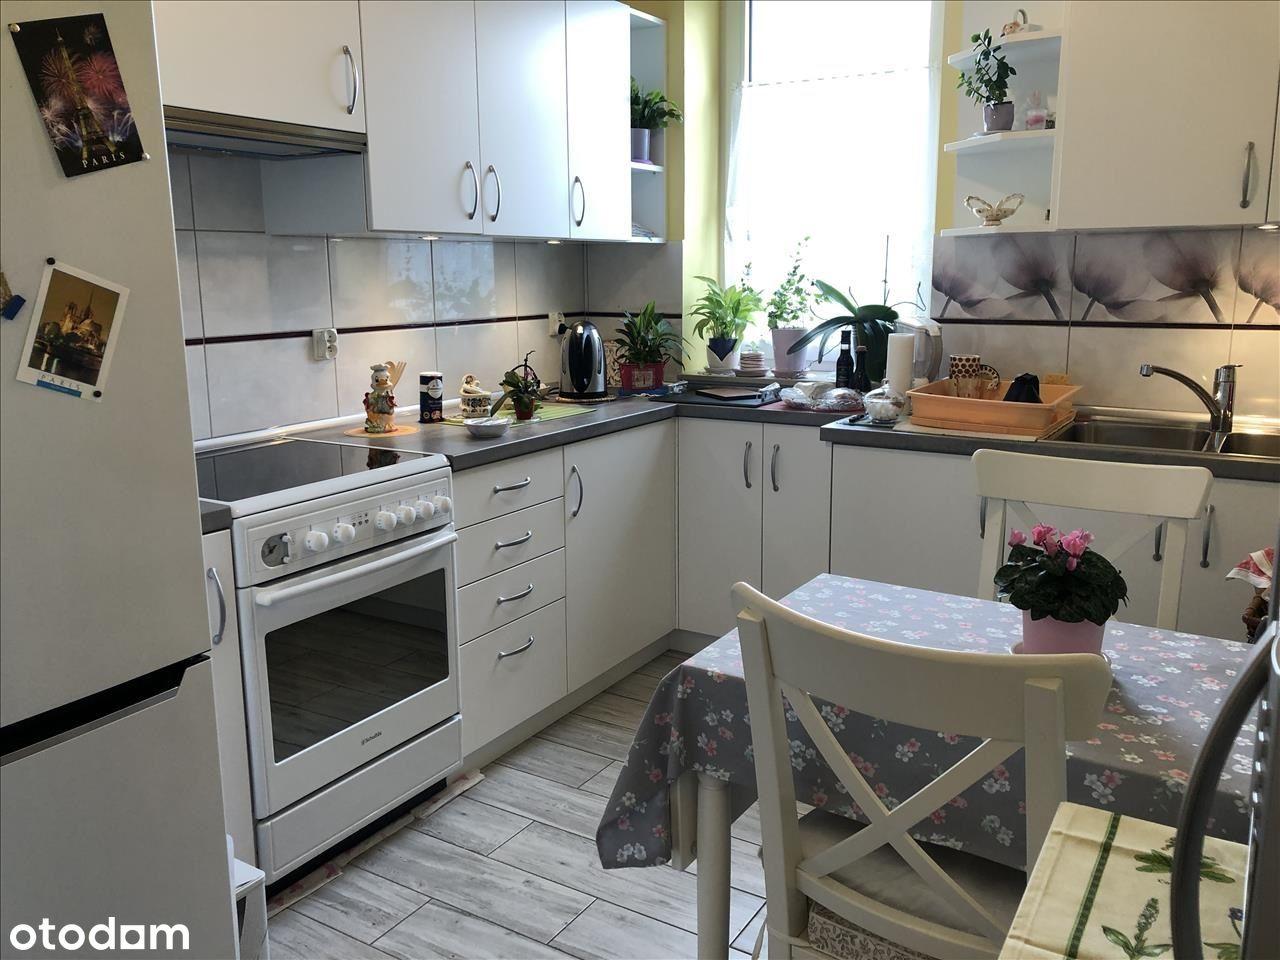 55m2| 2pok+kuchnia| balkon| 2xparking| 2011 -Olsza